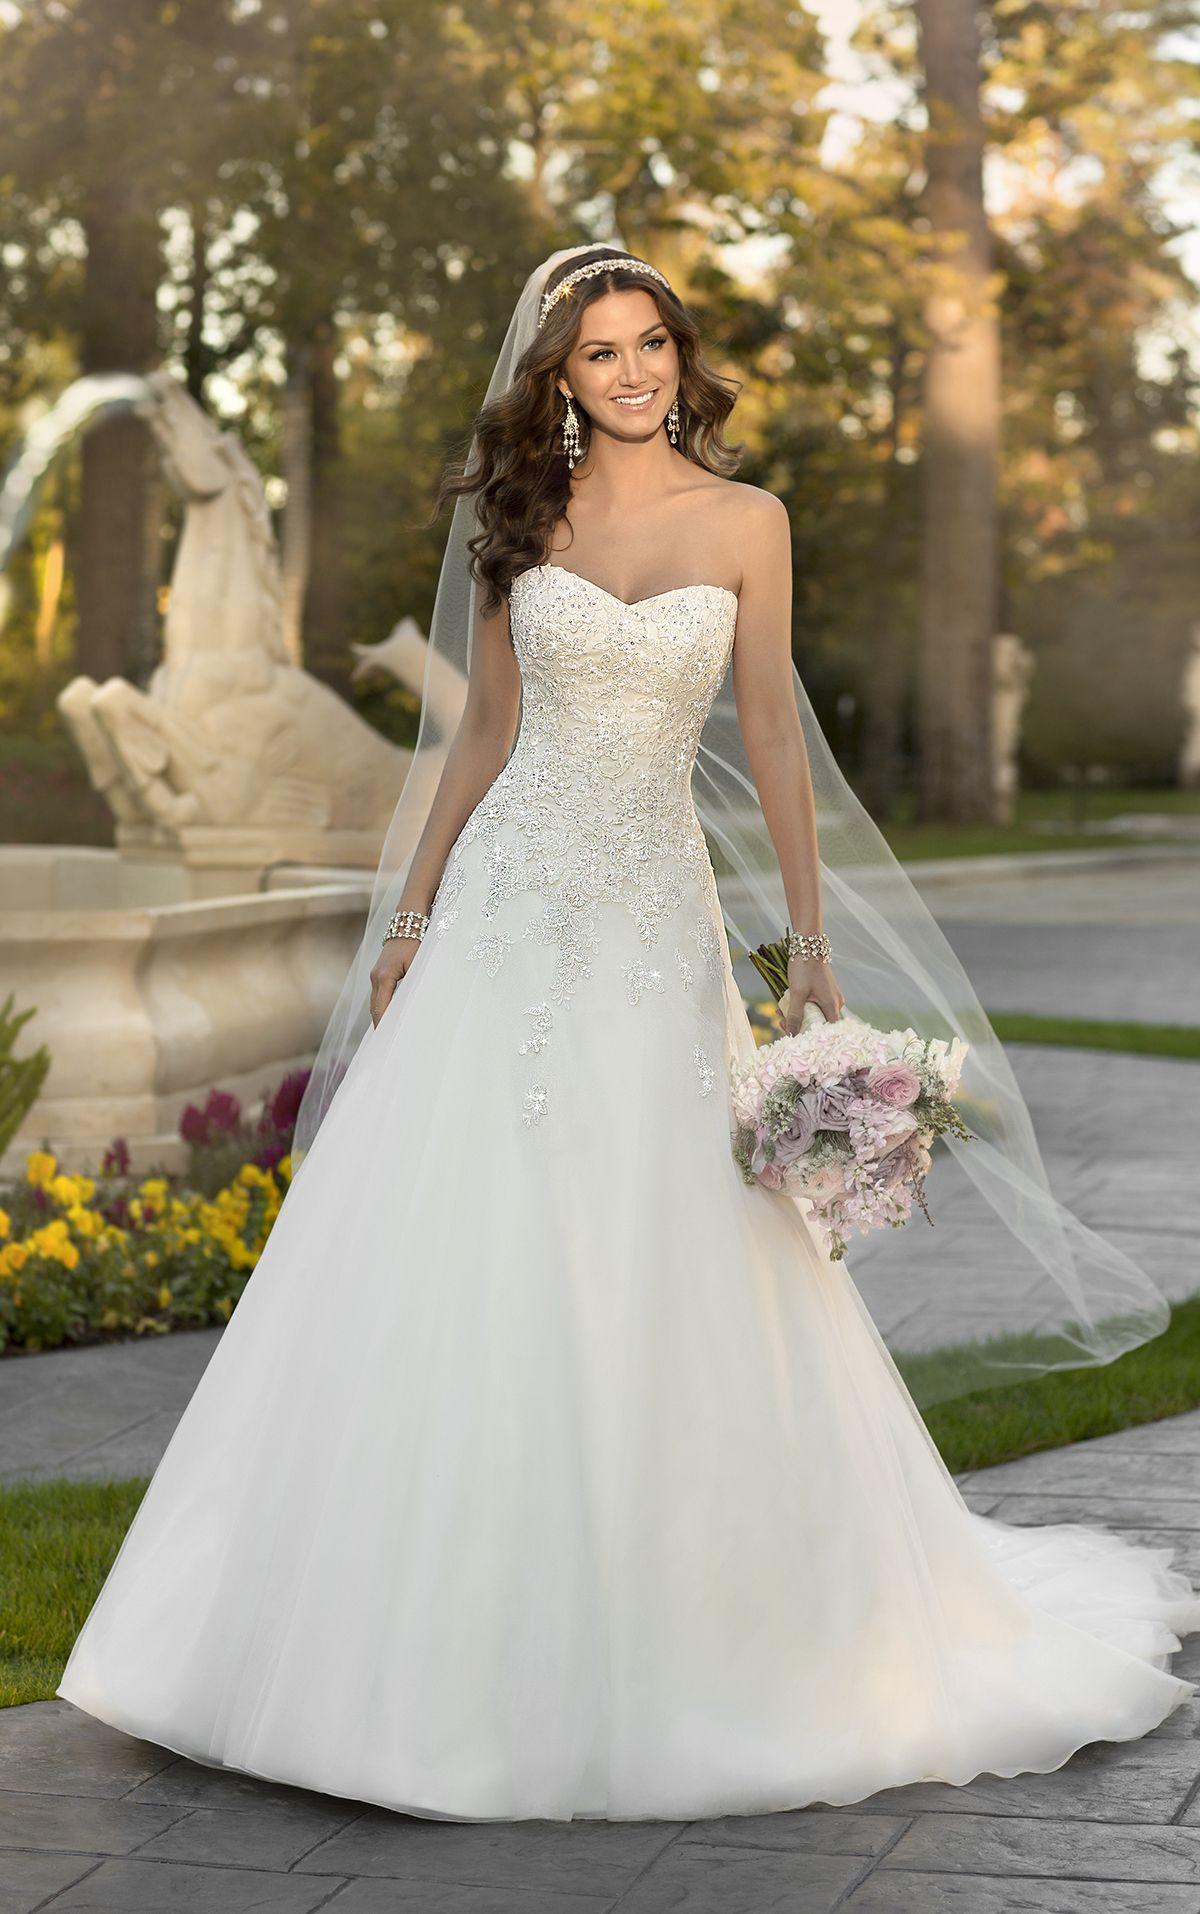 Mod wedding dress  Extravagant Stella York Wedding Dresses  wedding dresses